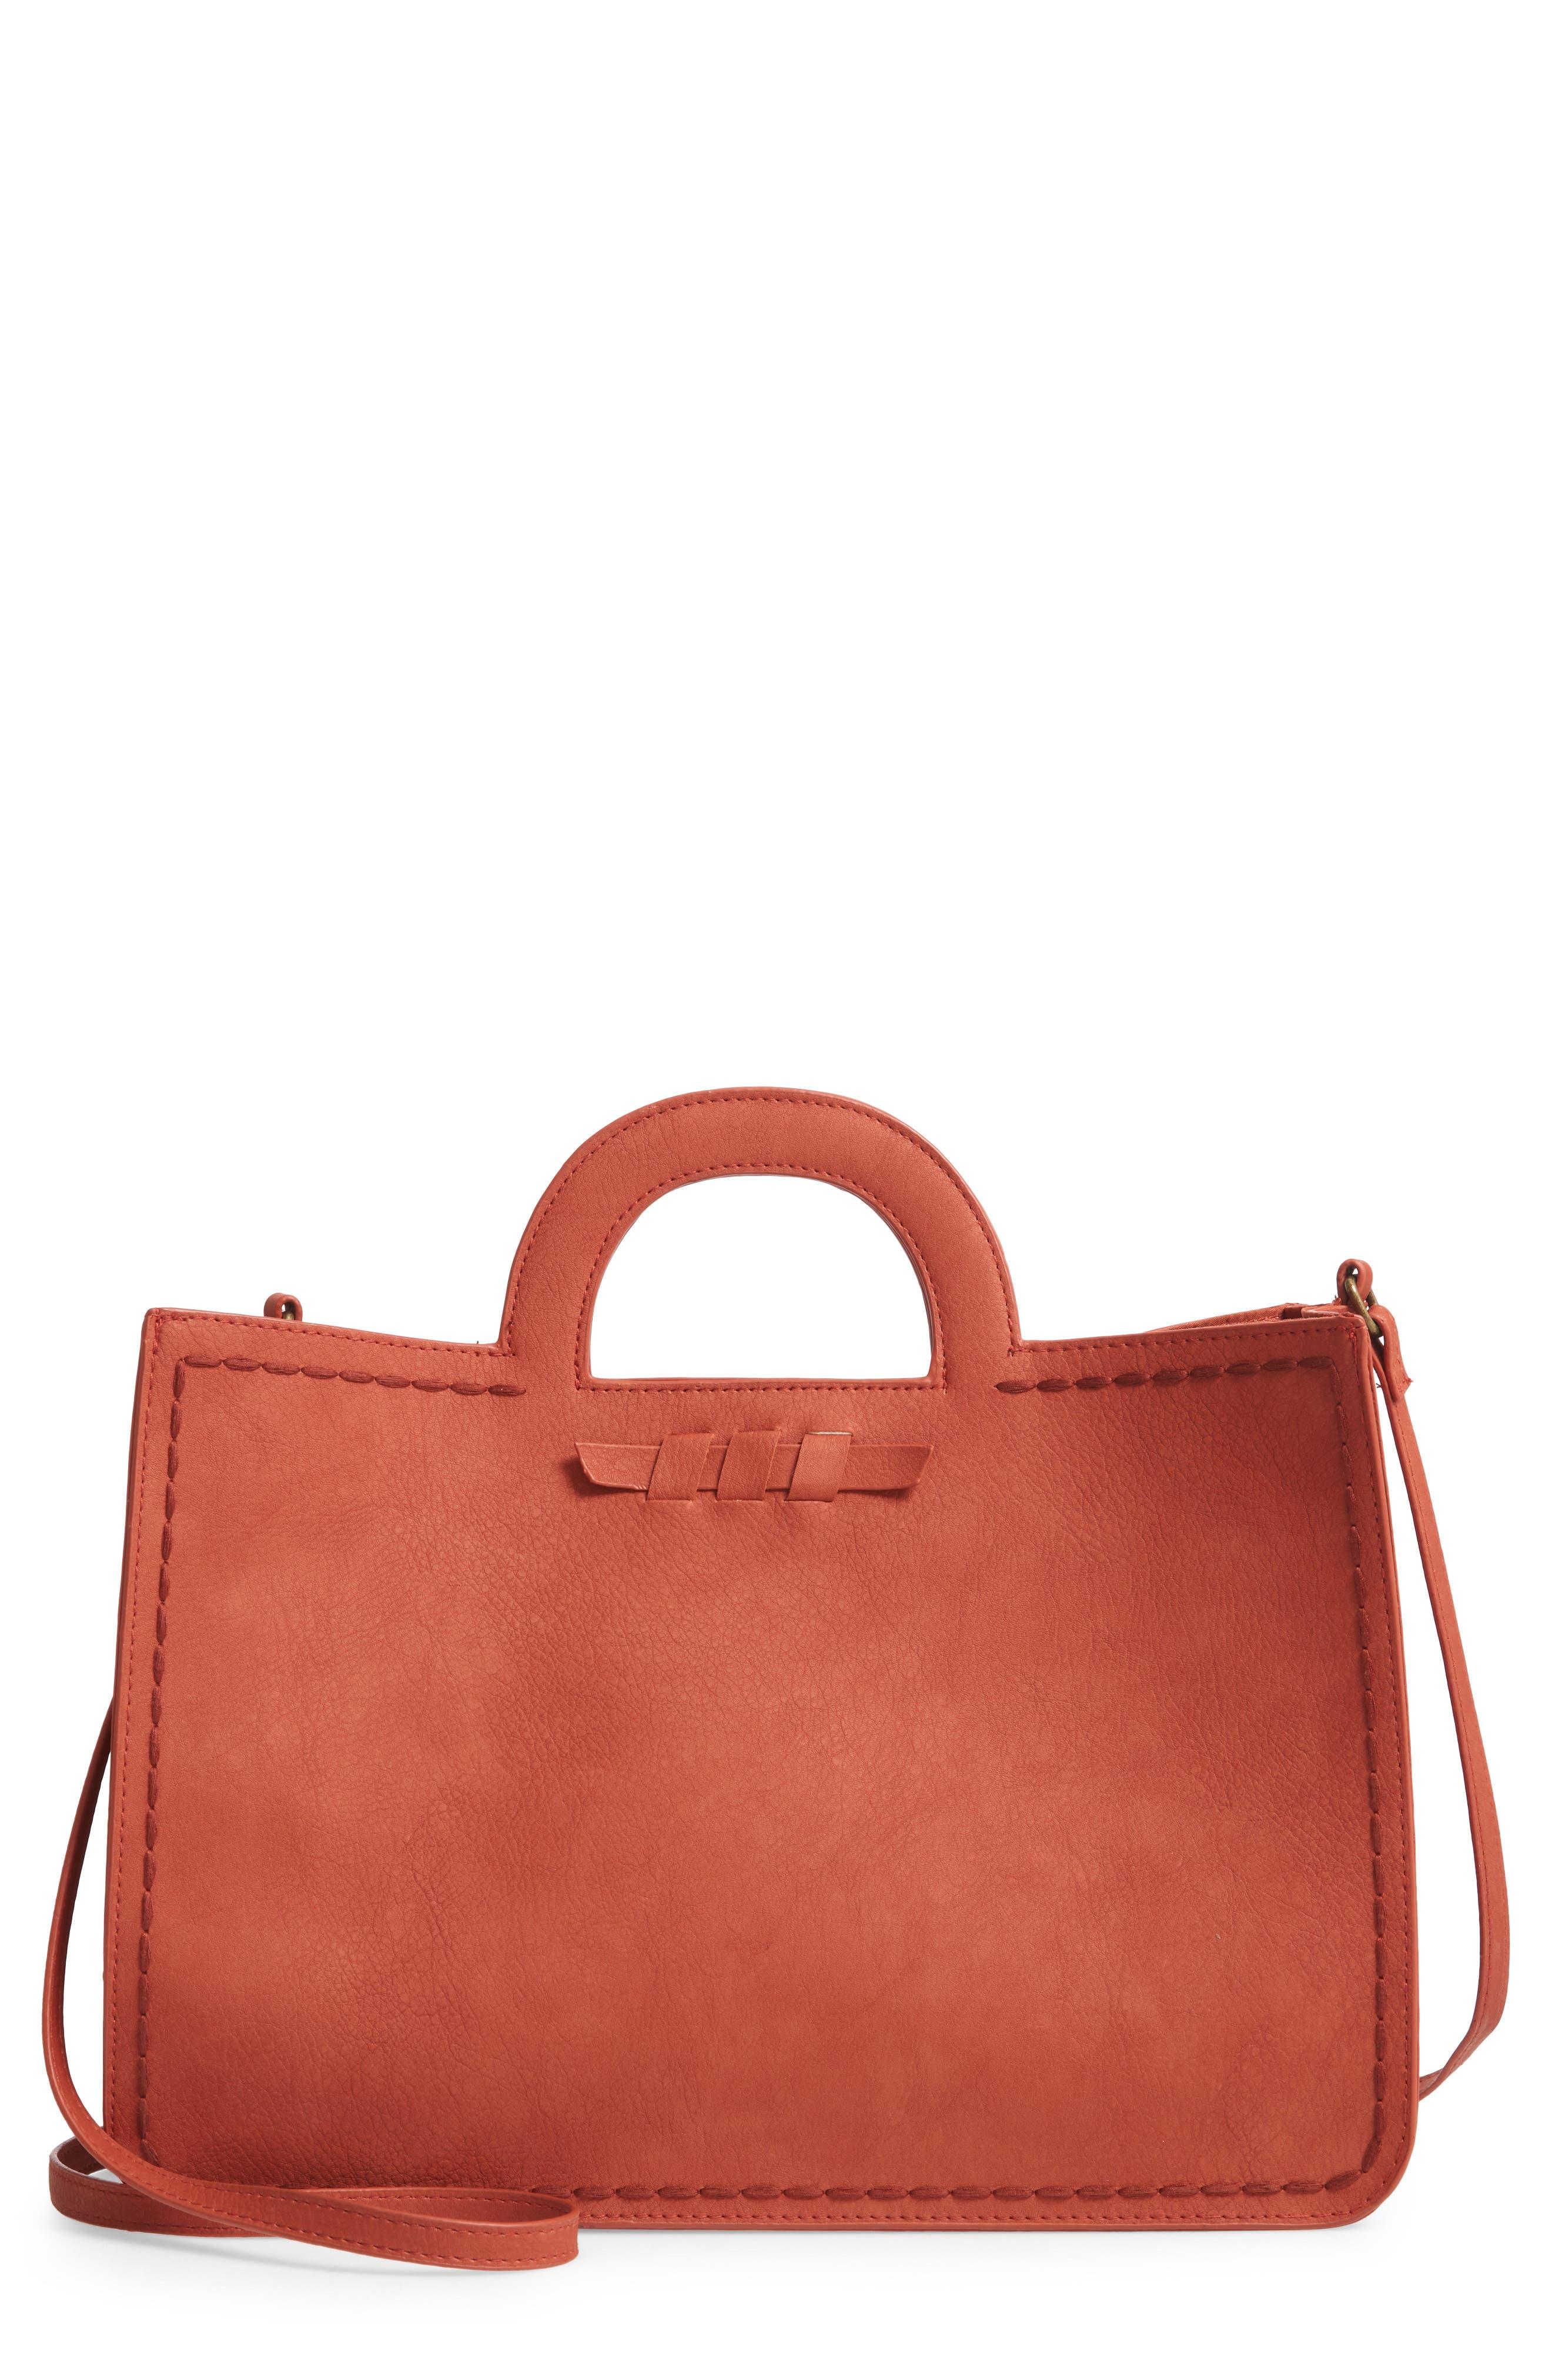 T-SHIRT & JEANS, Faux Leather Top Handle Tote Bag, Main thumbnail 1, color, 805